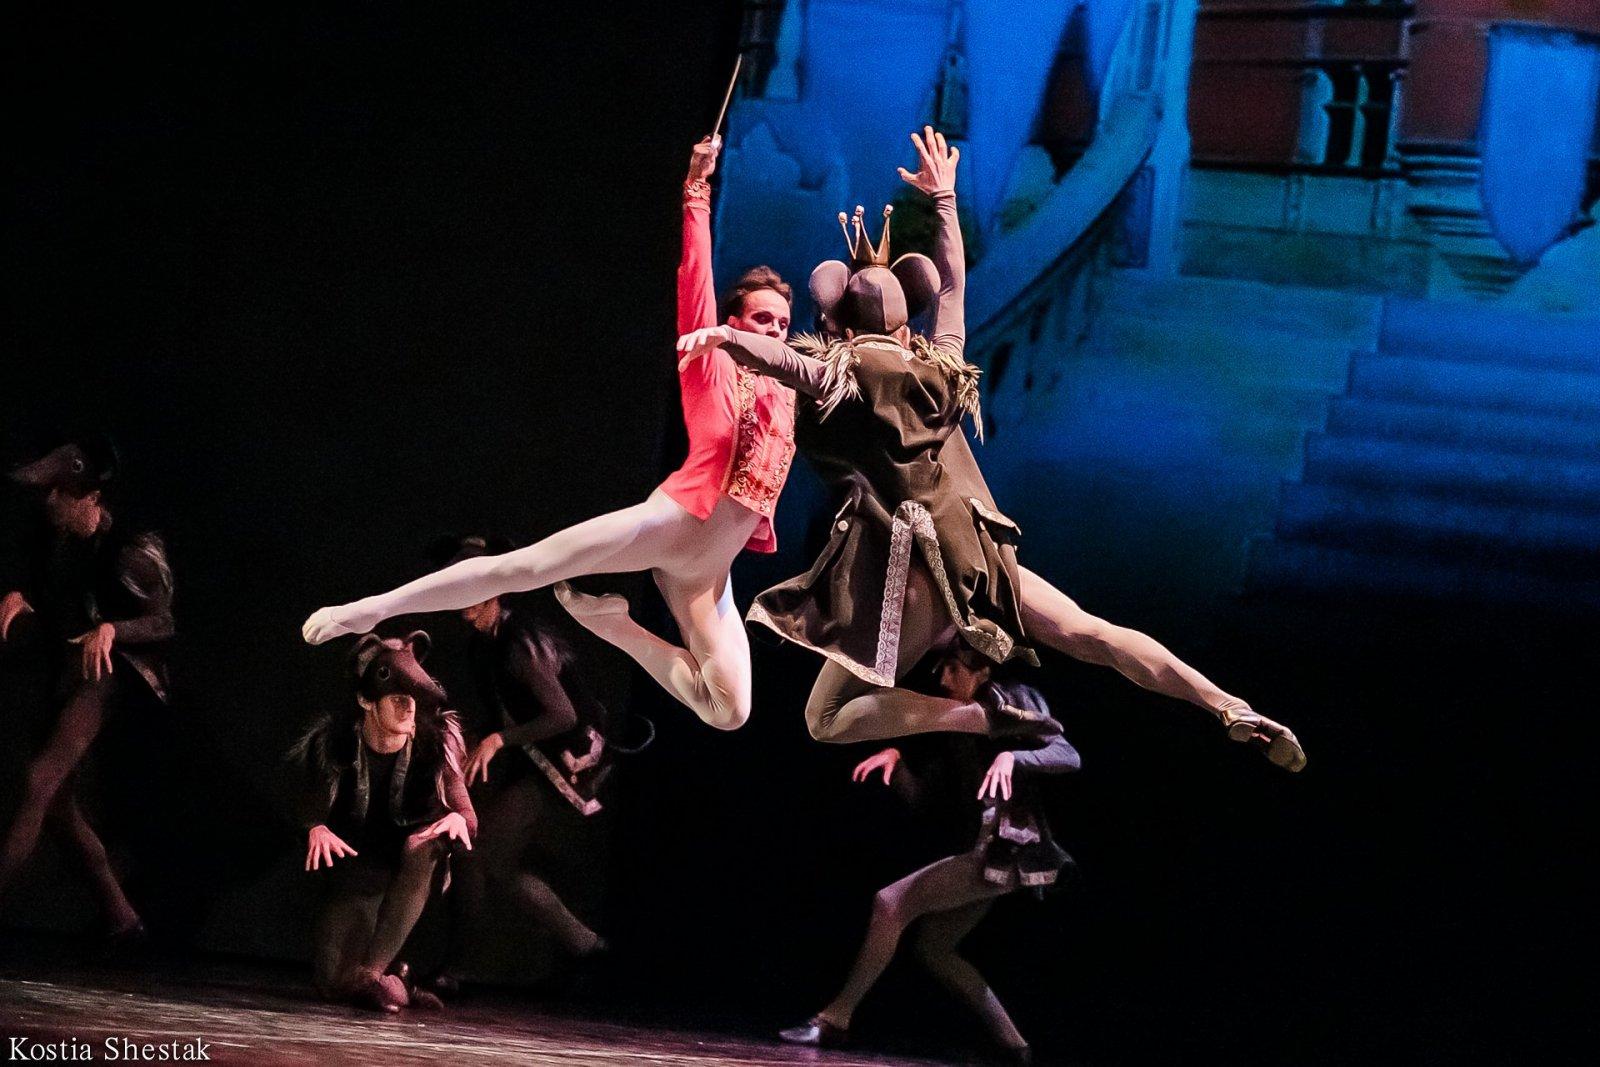 84287-balet-feeriya-schelkunchik-teatr-russkogo-baleta-talarium-et-lux-pod-m.jpg